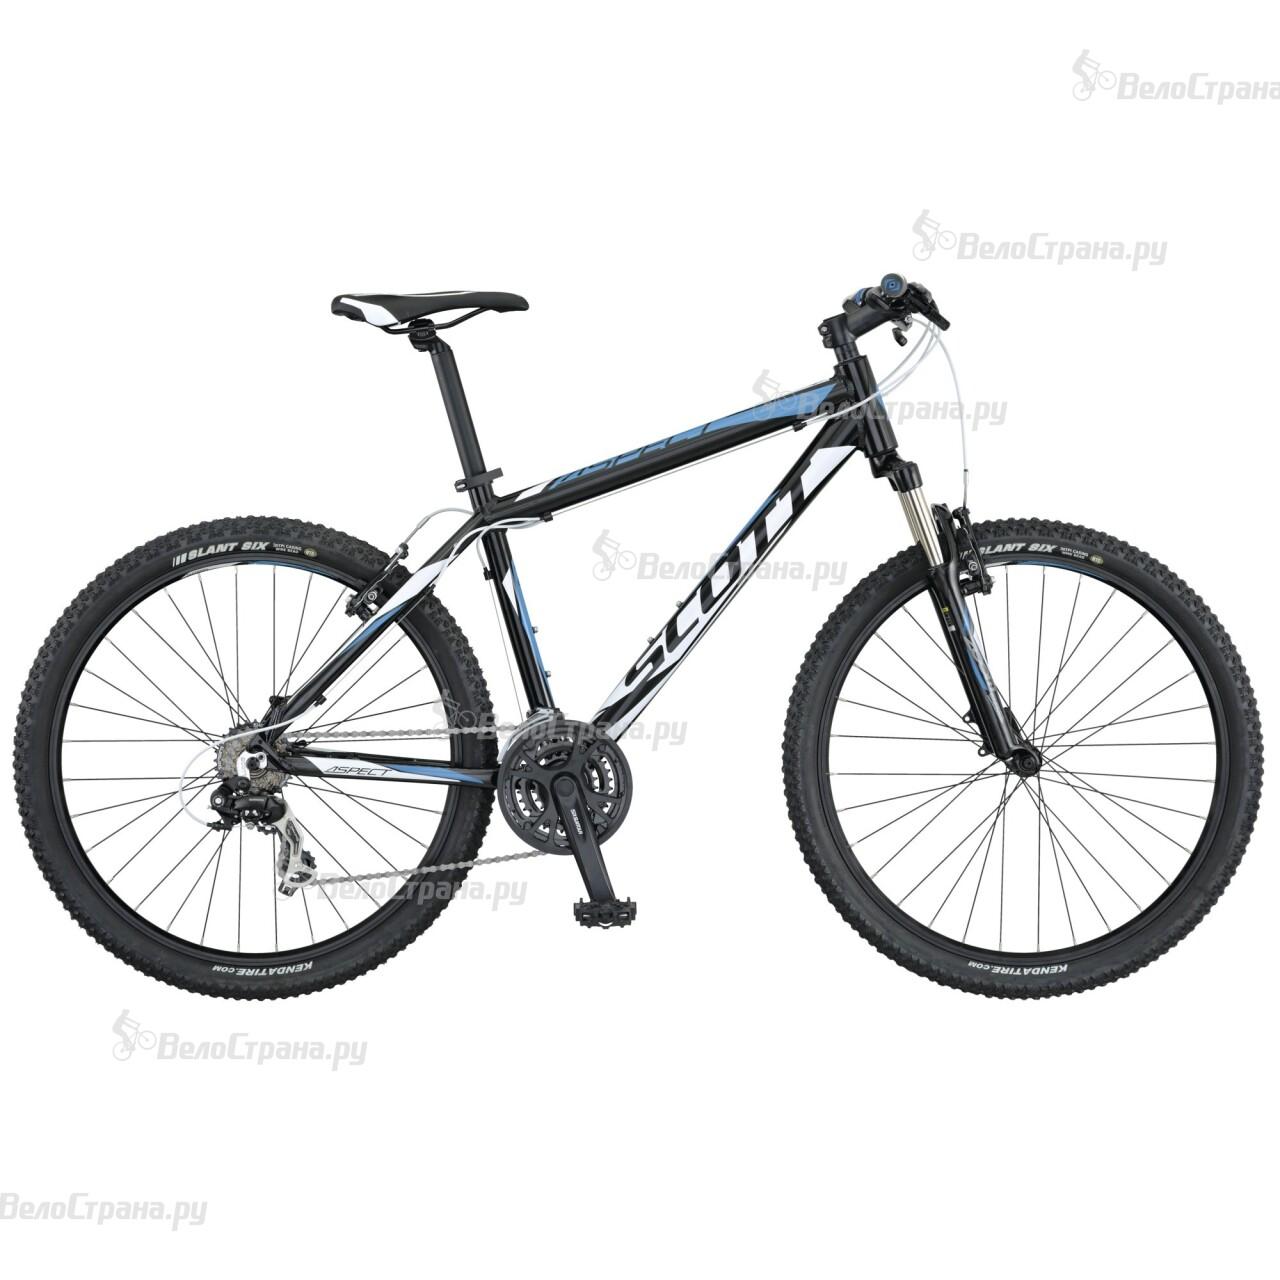 Велосипед Scott Aspect 680 (2015)